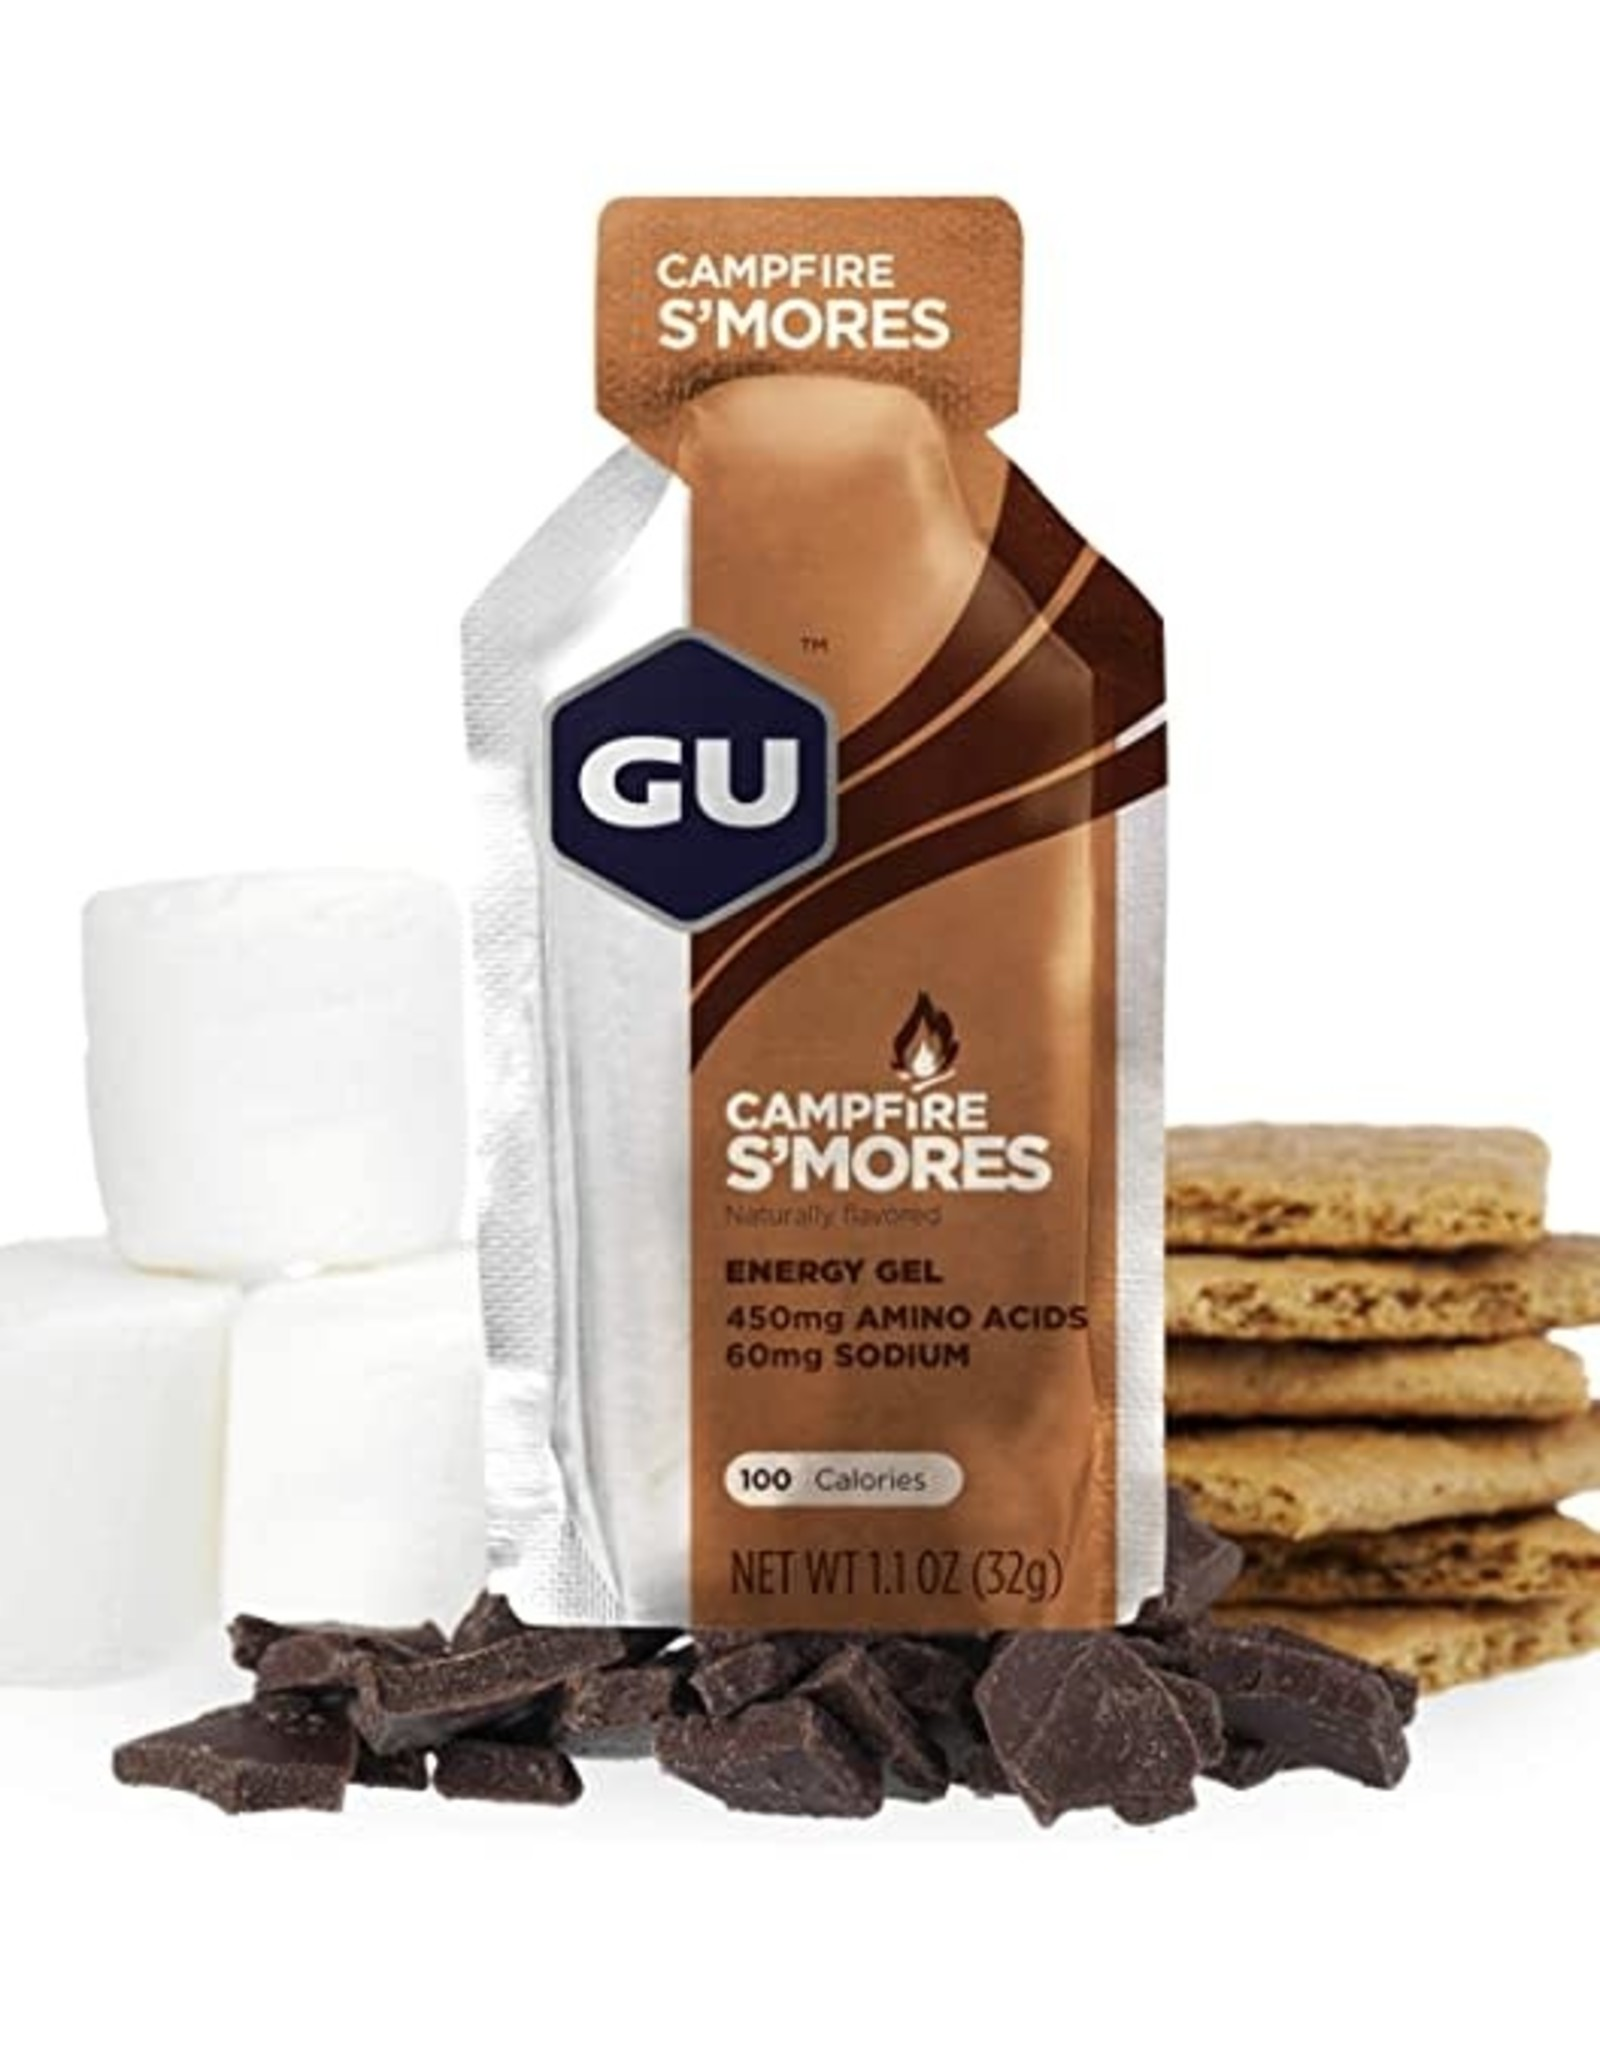 GU Energy Labs GU Campfire S'Mores Gel Box of 24 single